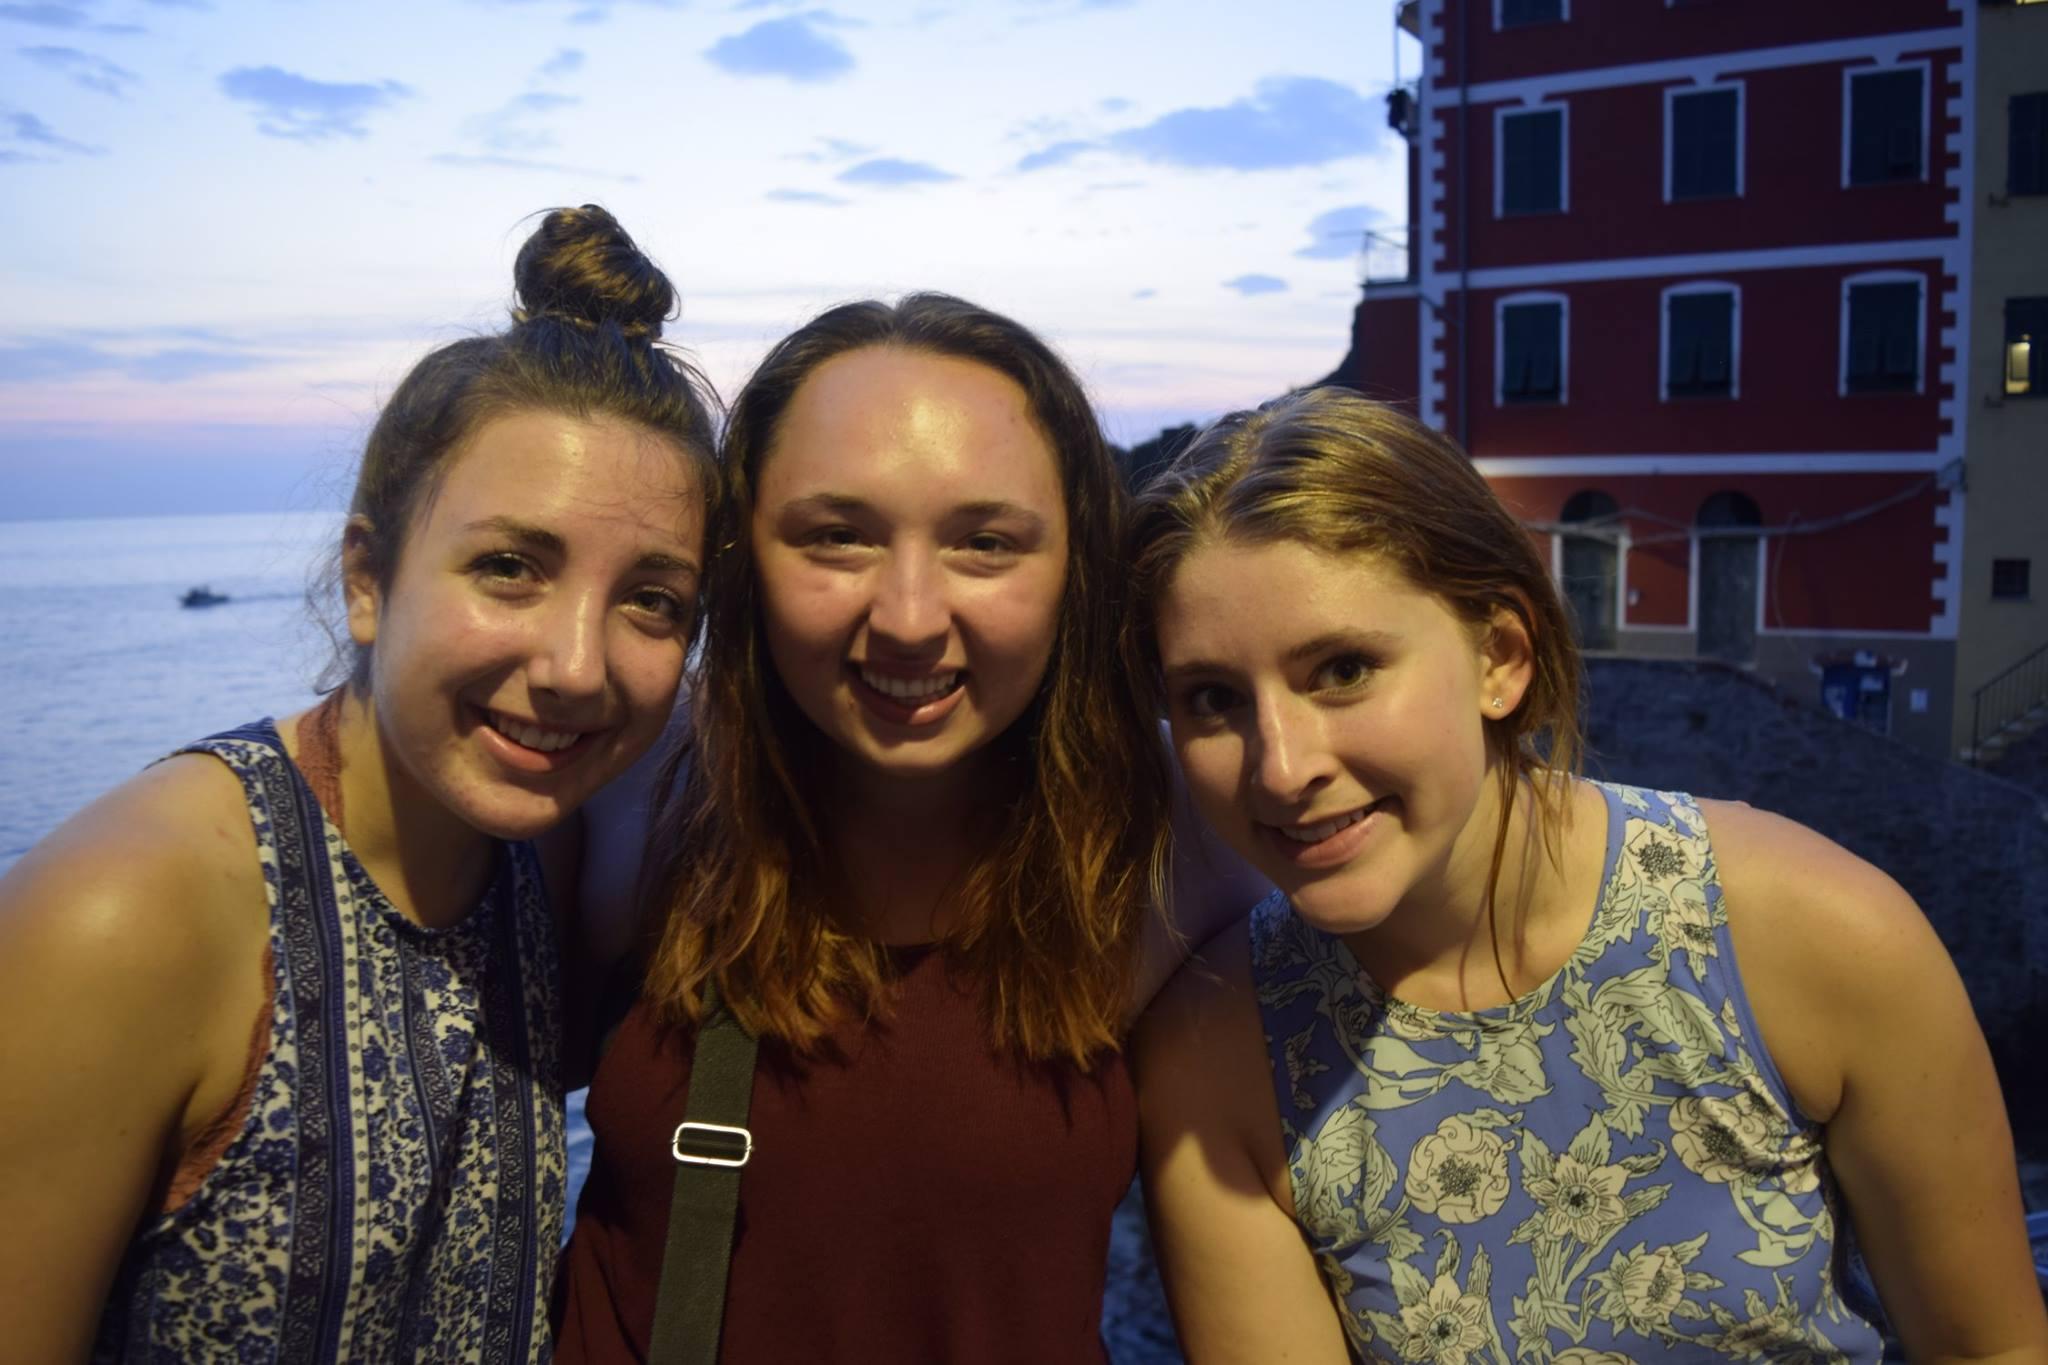 Pictured from left: Emma Peretz, Sydney Watt, September McCarthy Photo by Nikk Tetreault